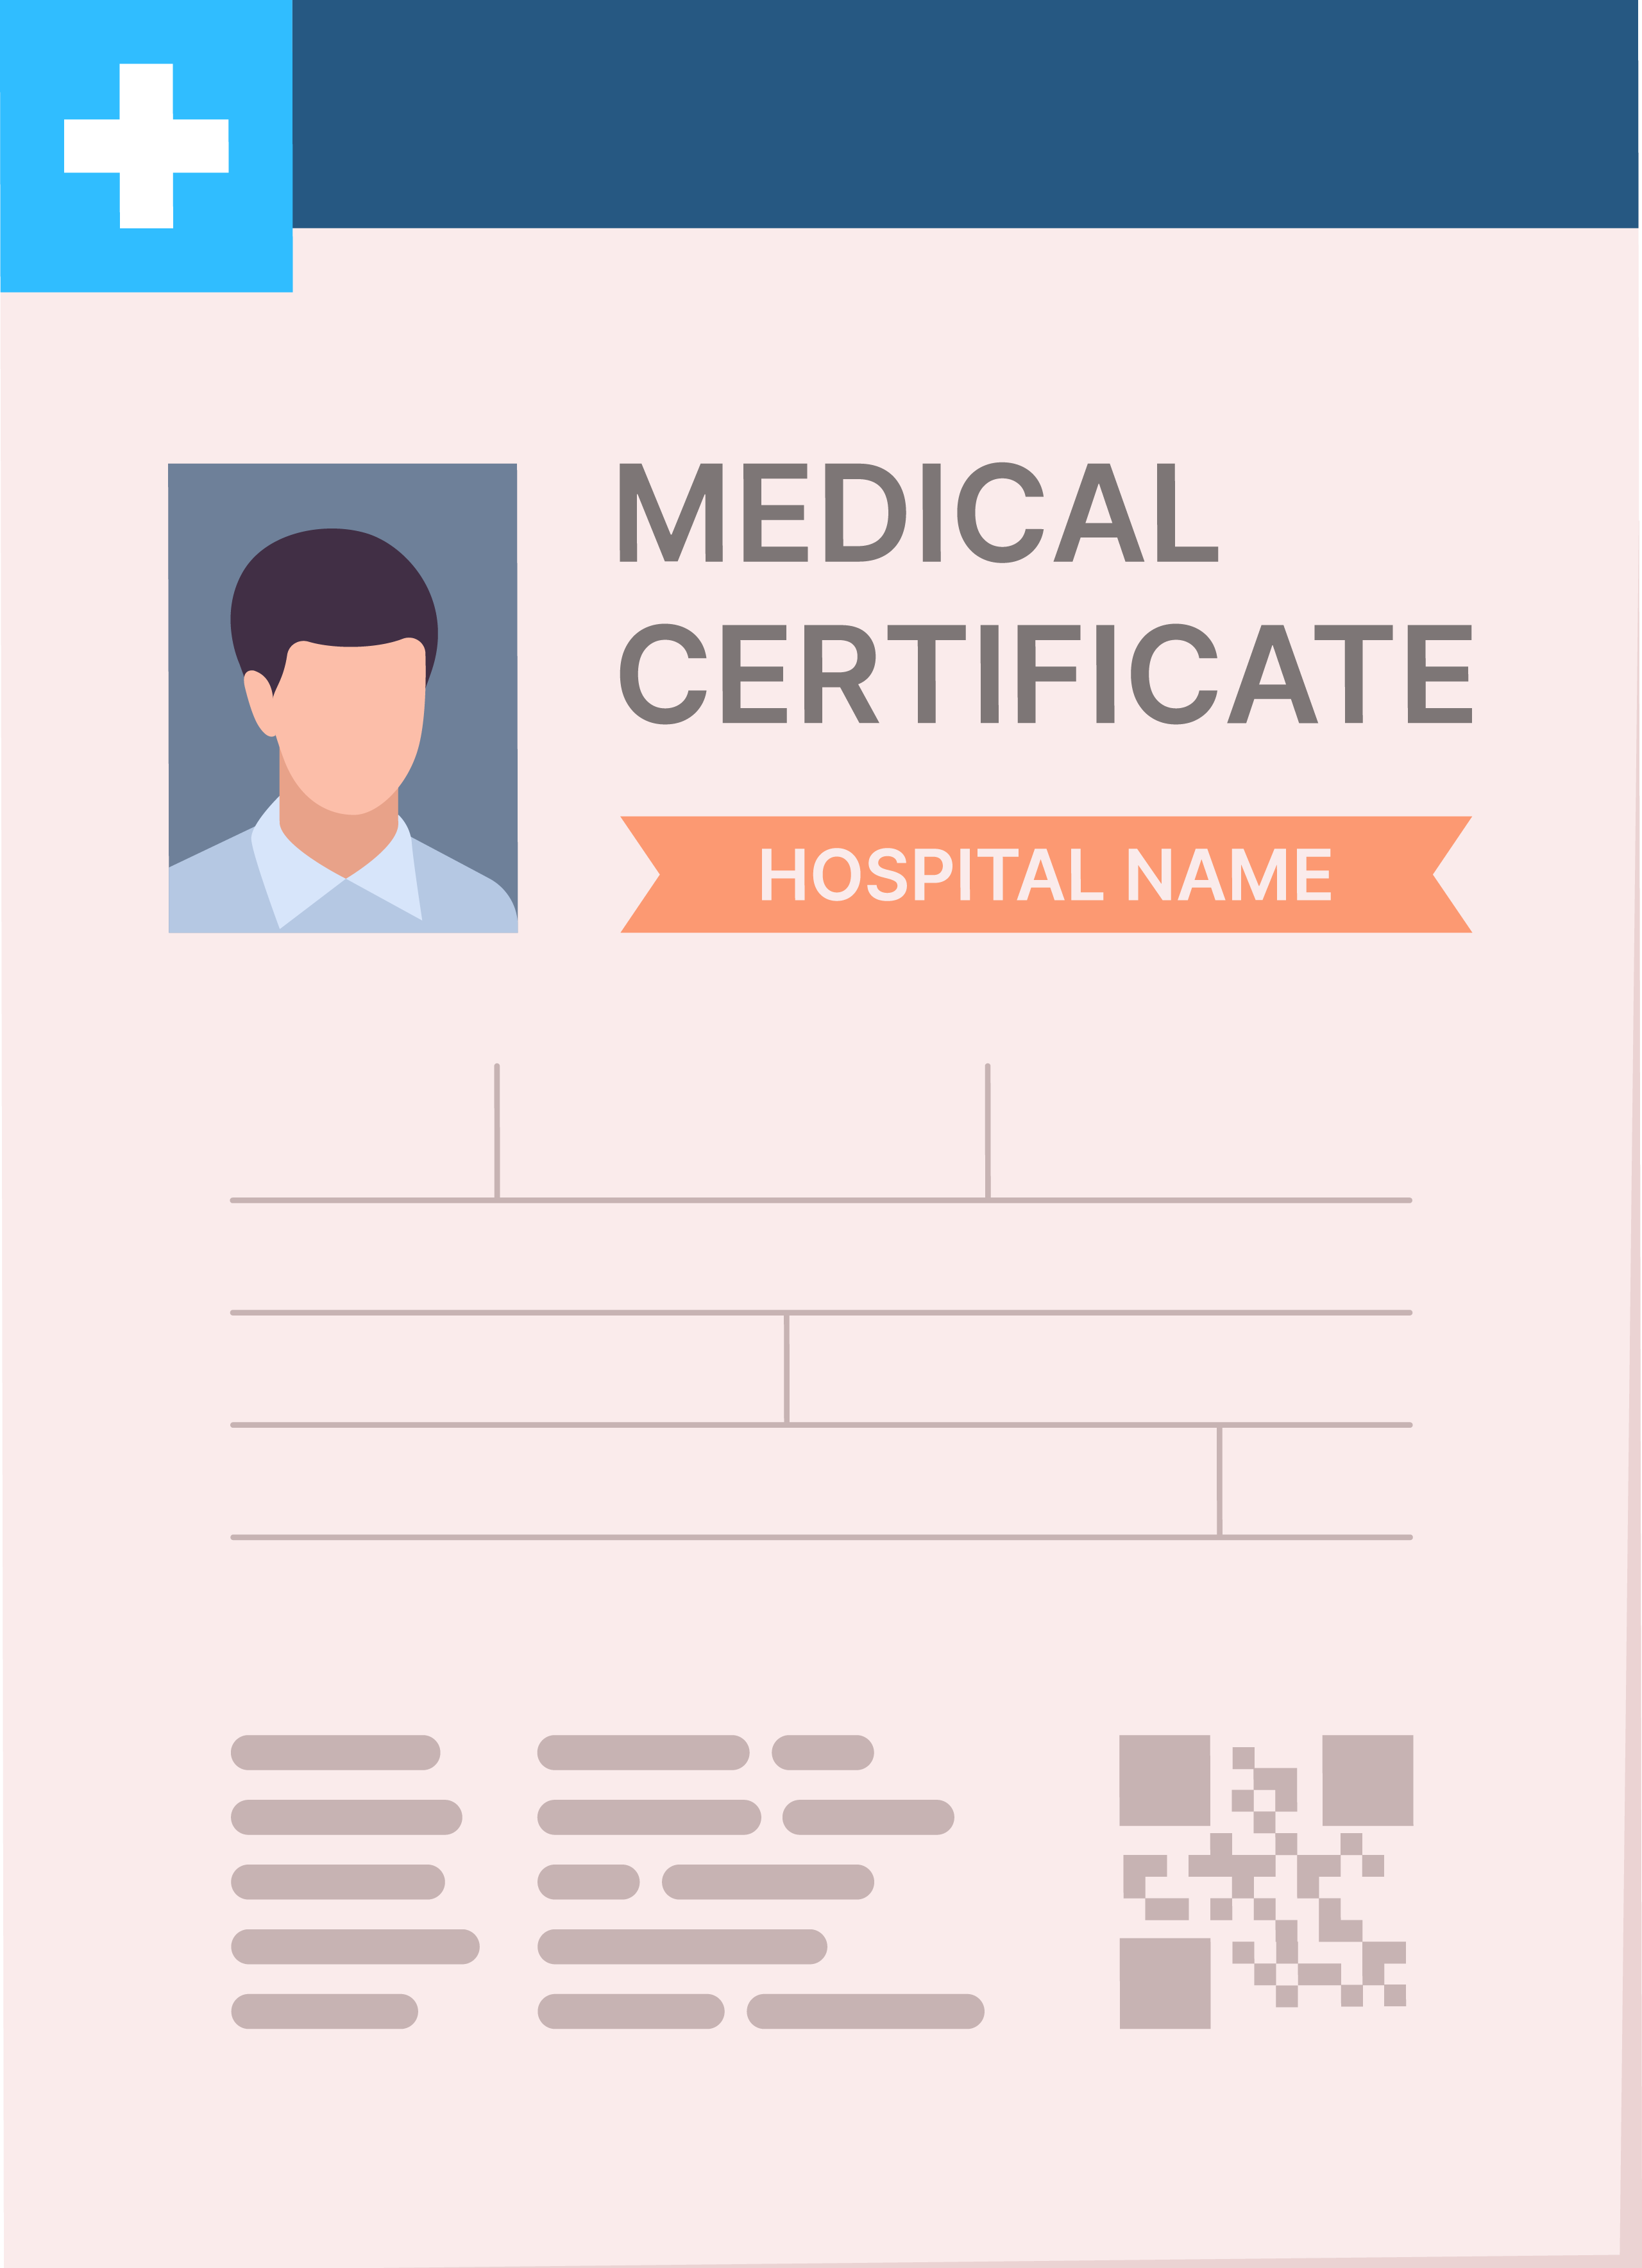 commercial pilot 2nd class medical certificate